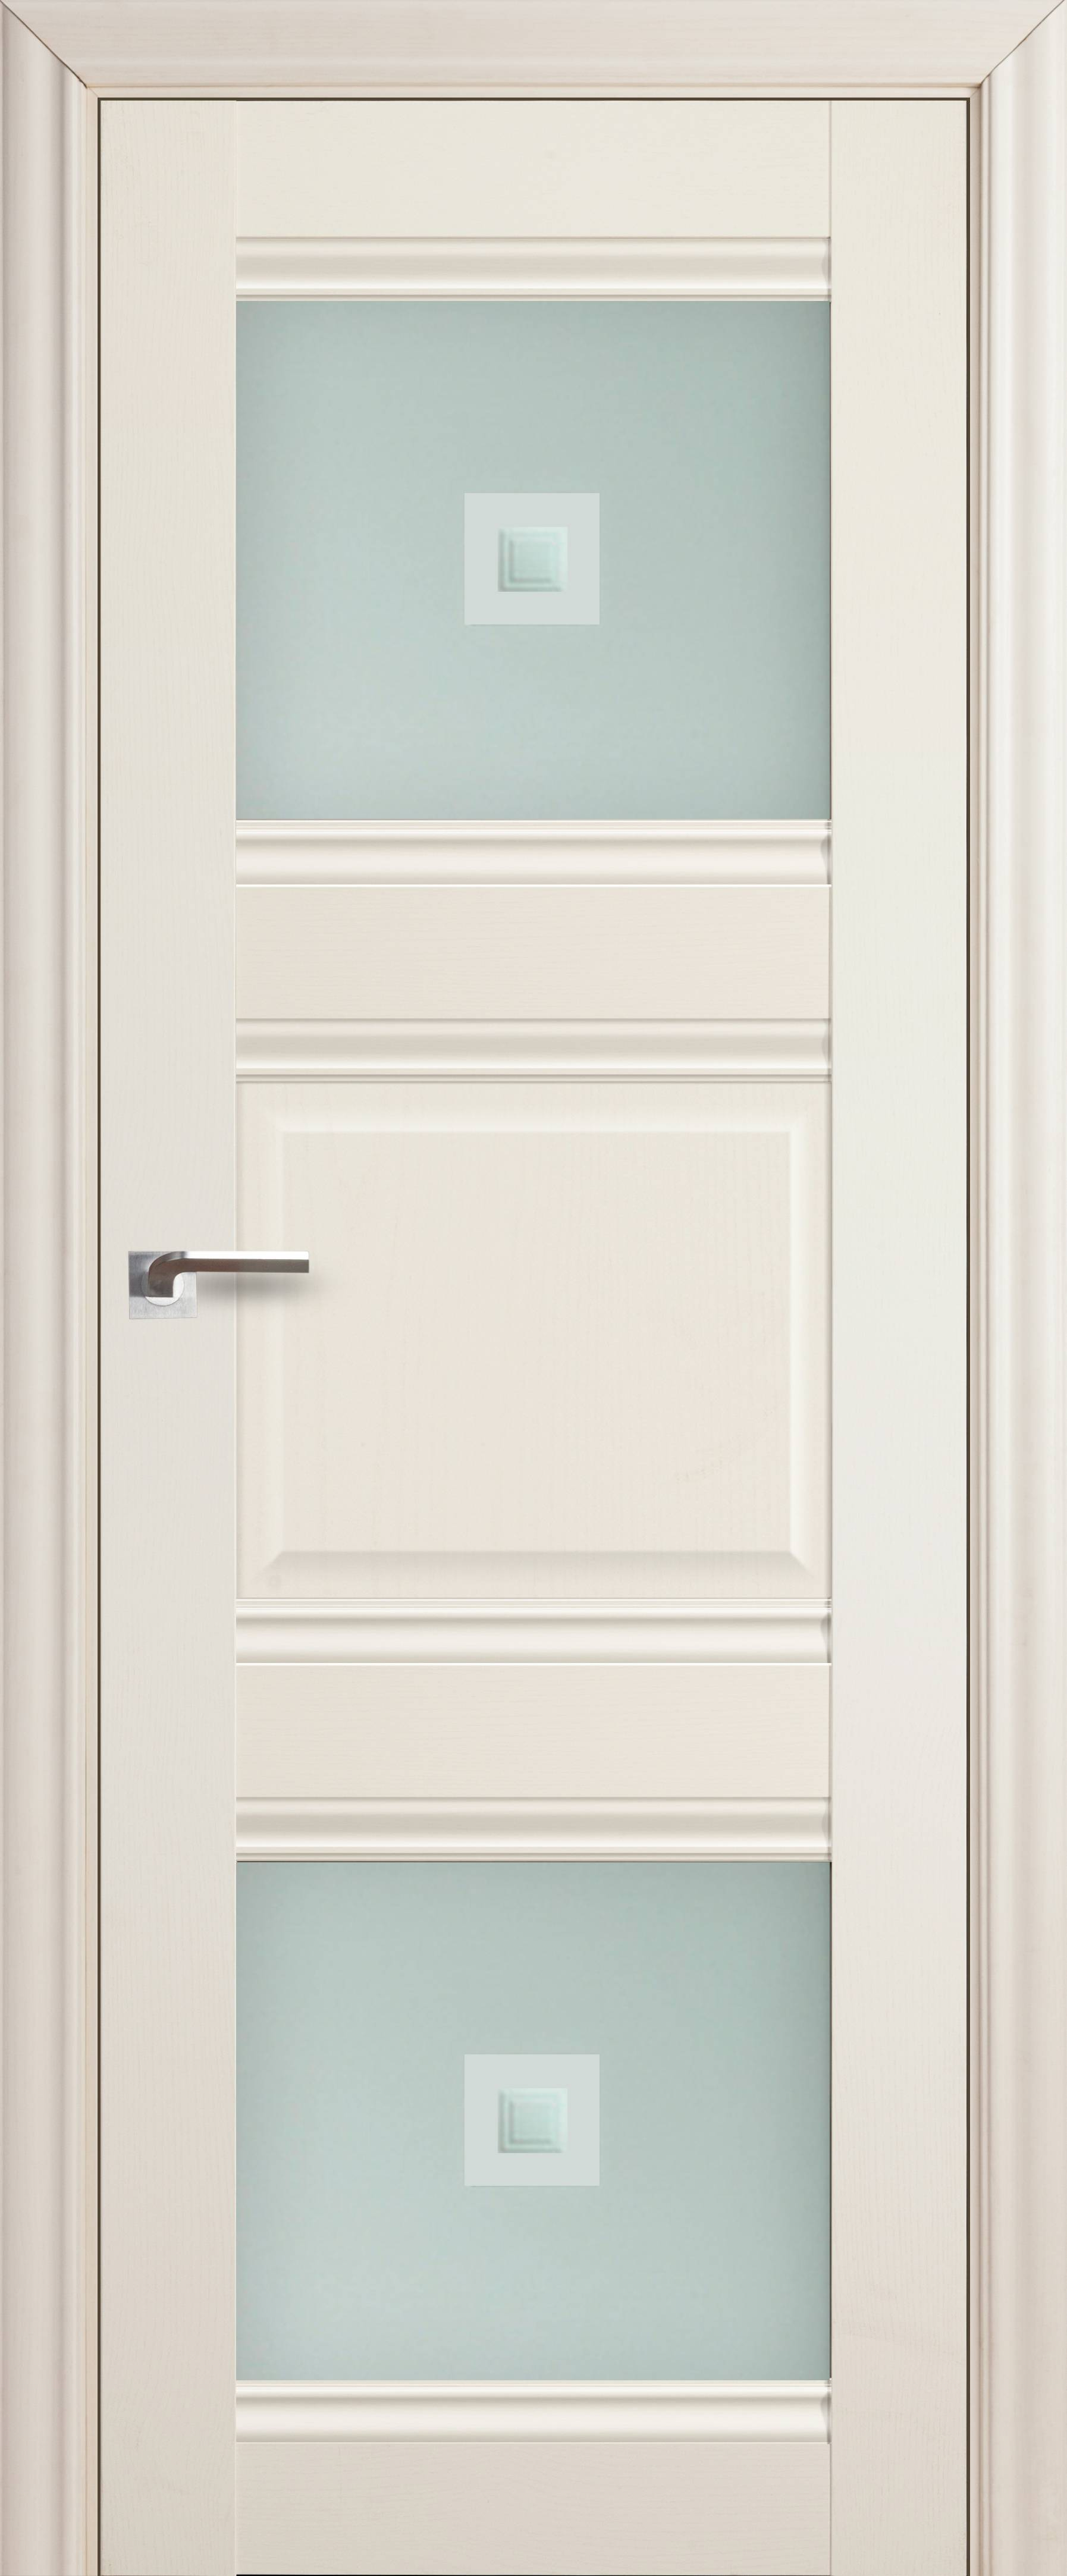 Фото двери Модель 6Х